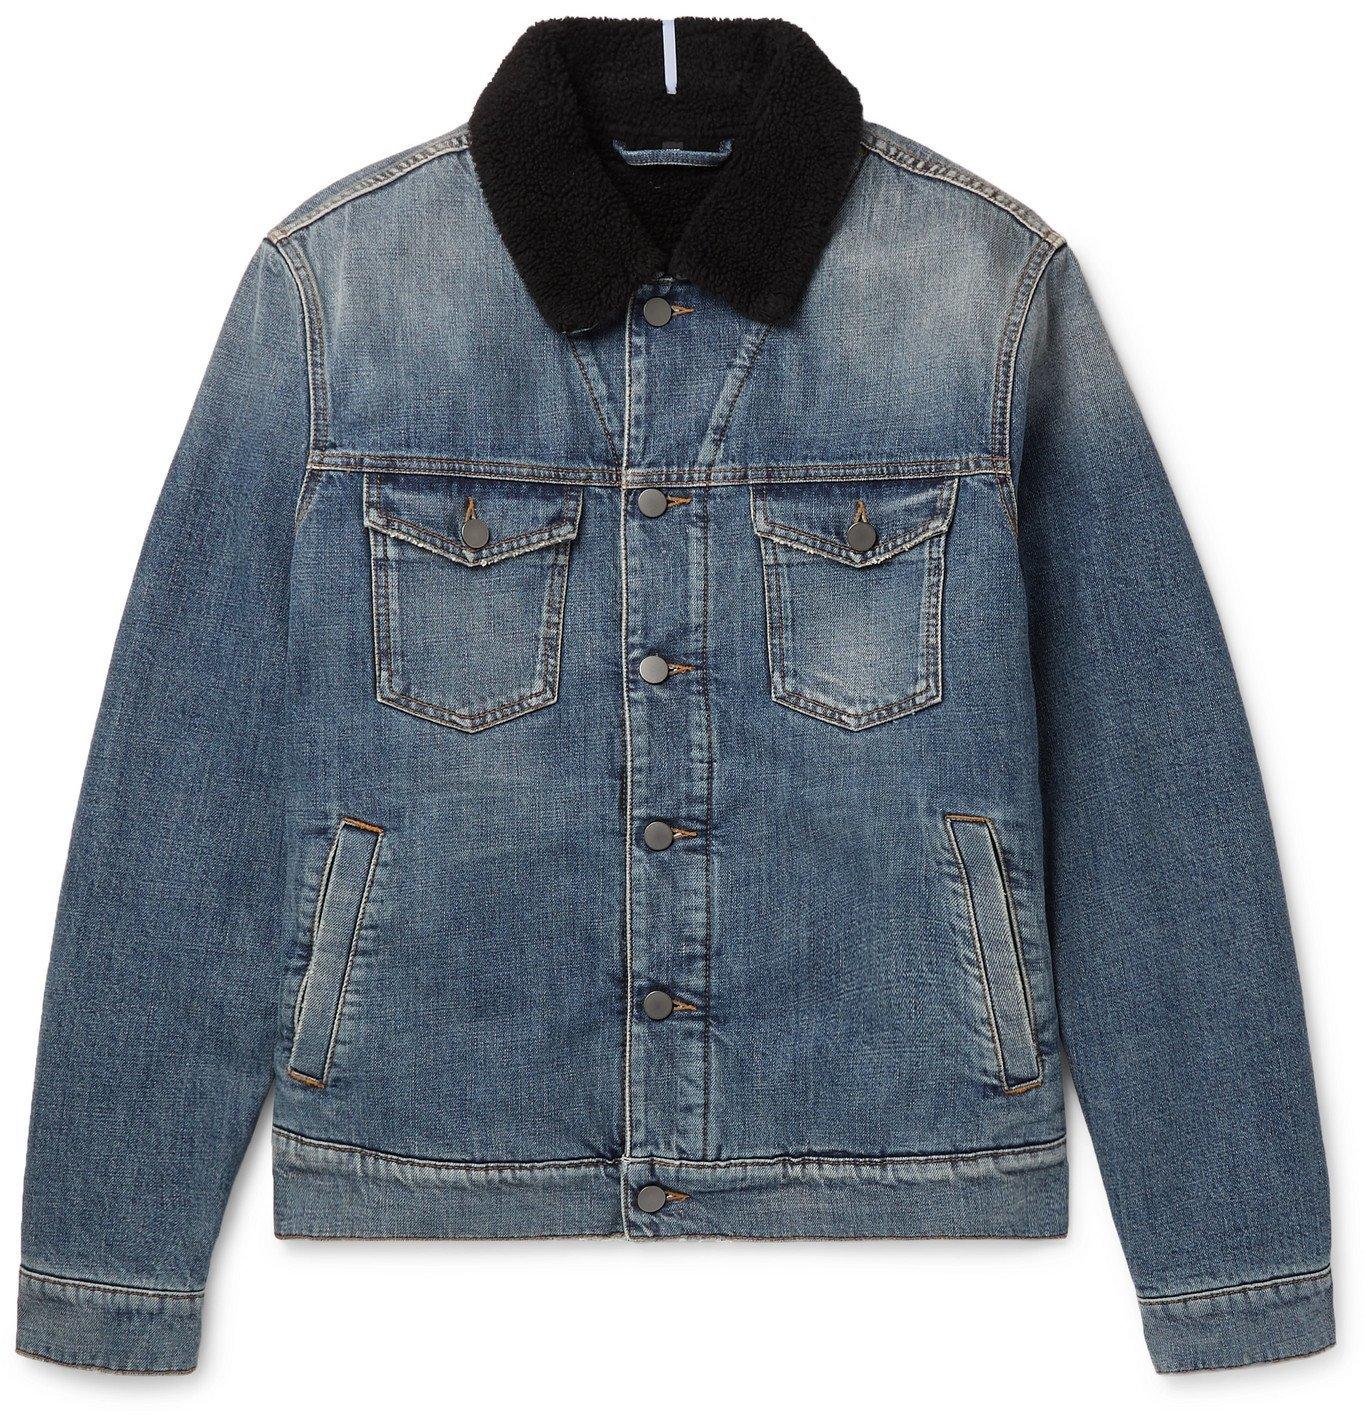 MCQ - Faux Shearling-Lined Denim Jacket - Blue